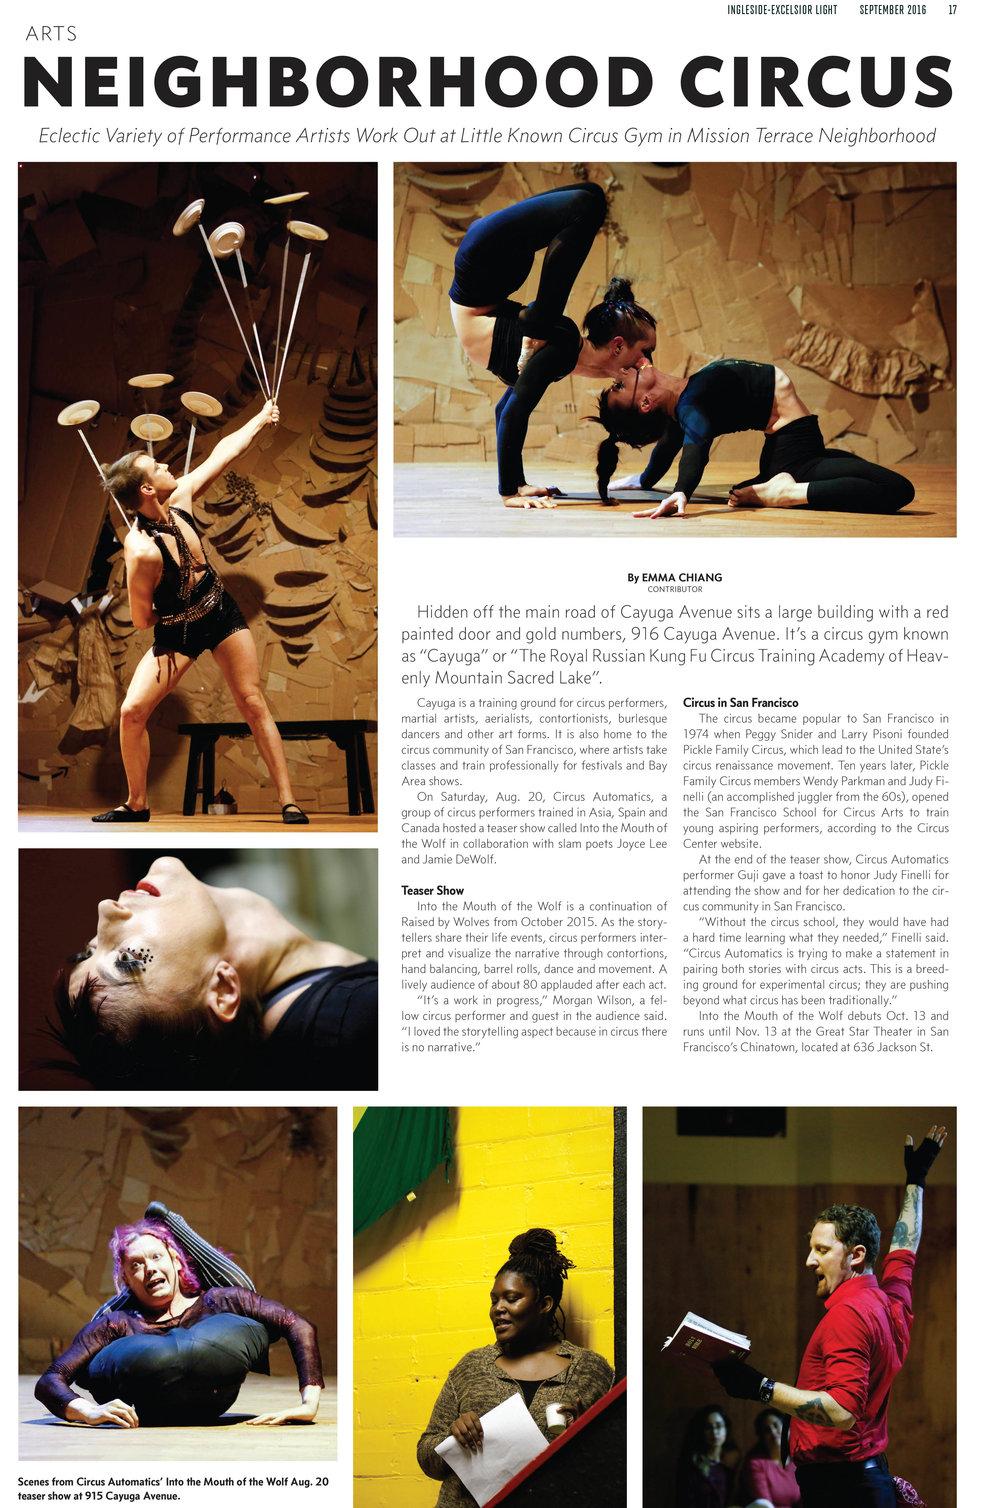 SEPT 2016 Page 17.jpg